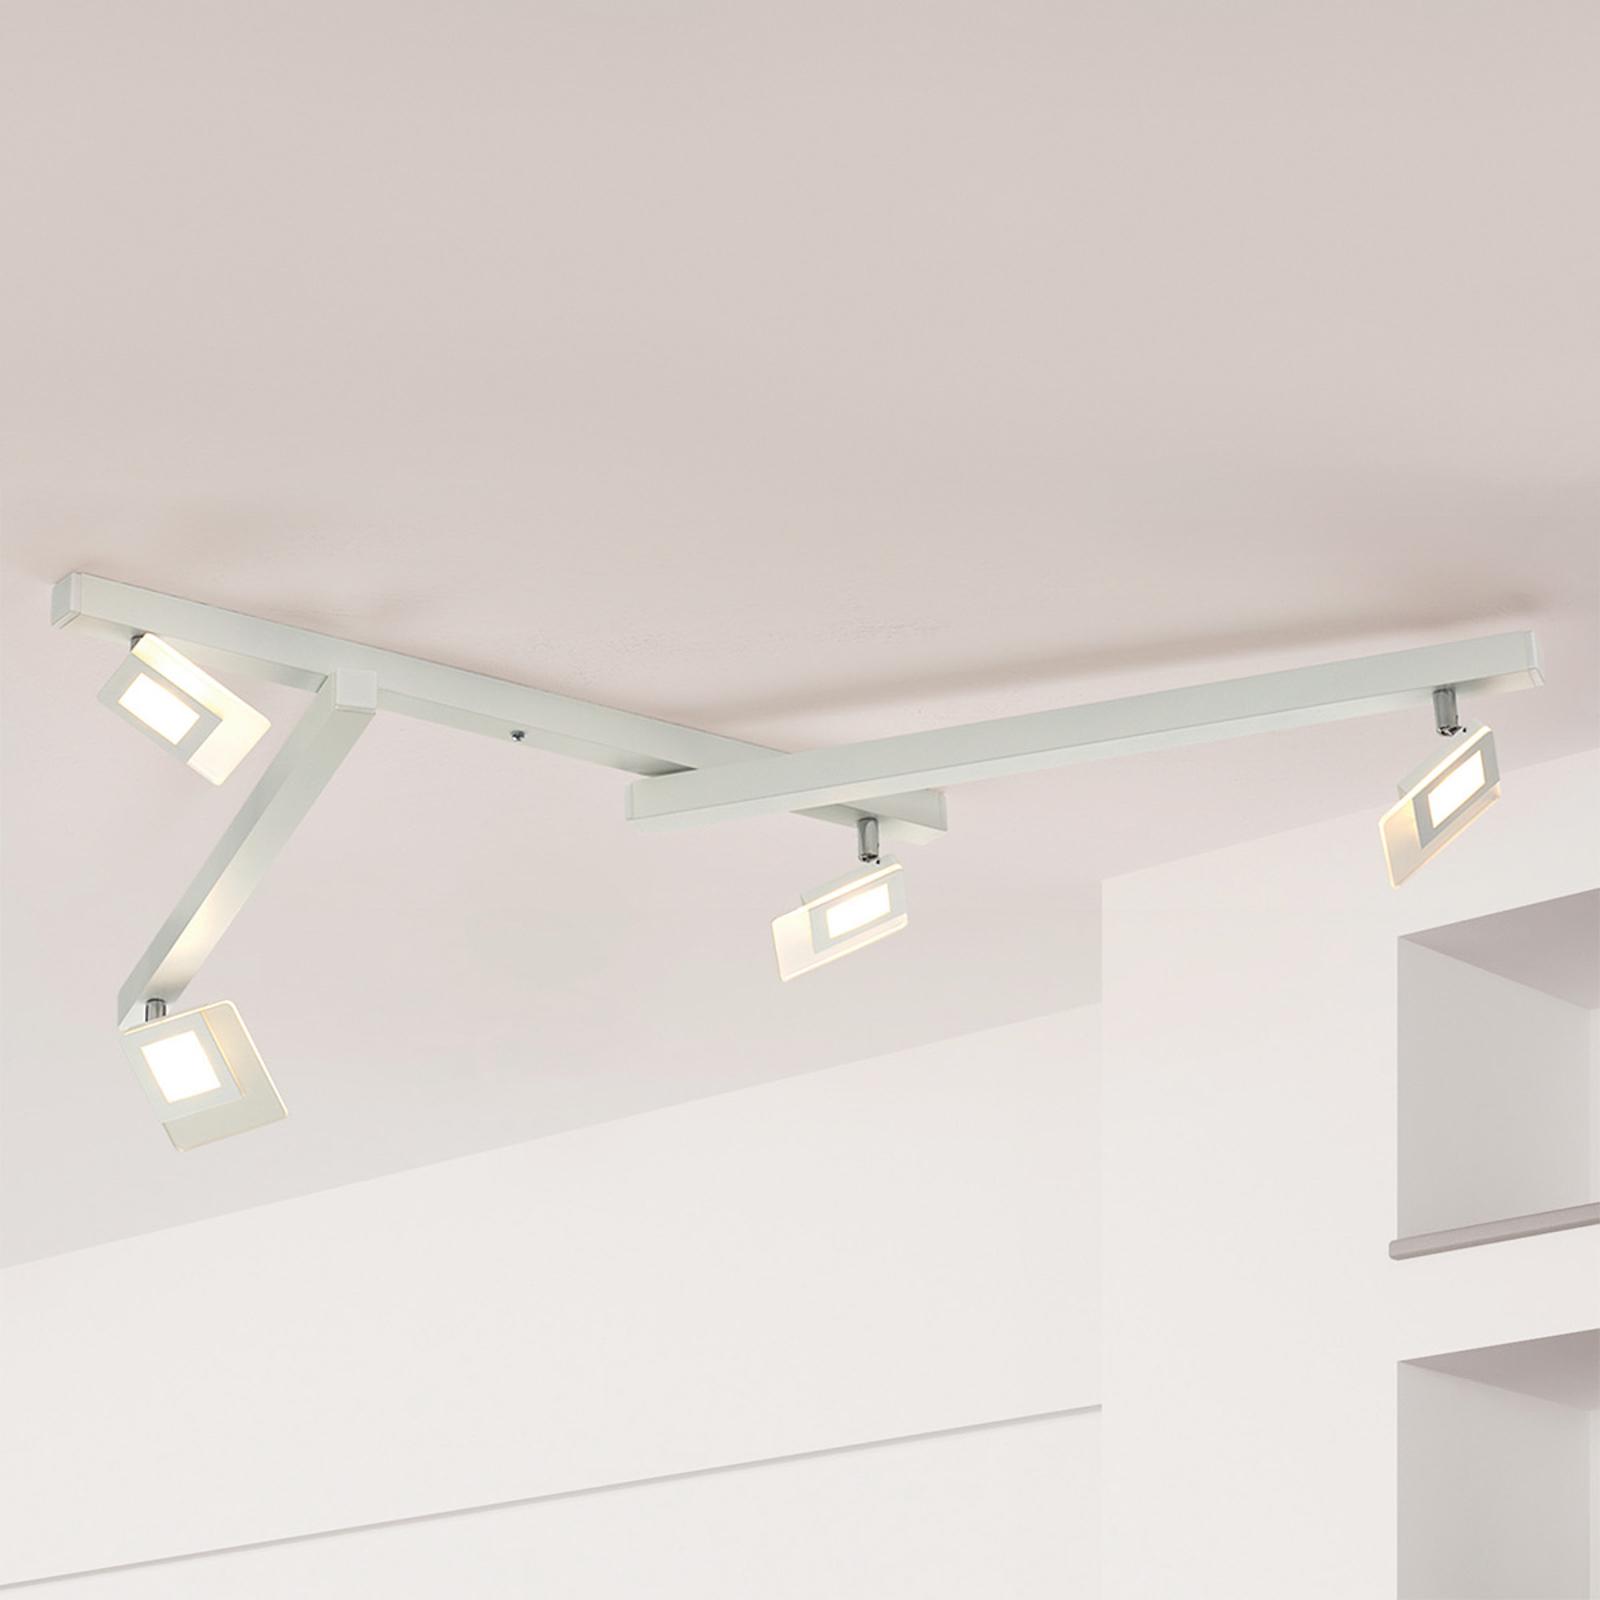 Plafoniera LED bianca Line a 5 punti luce